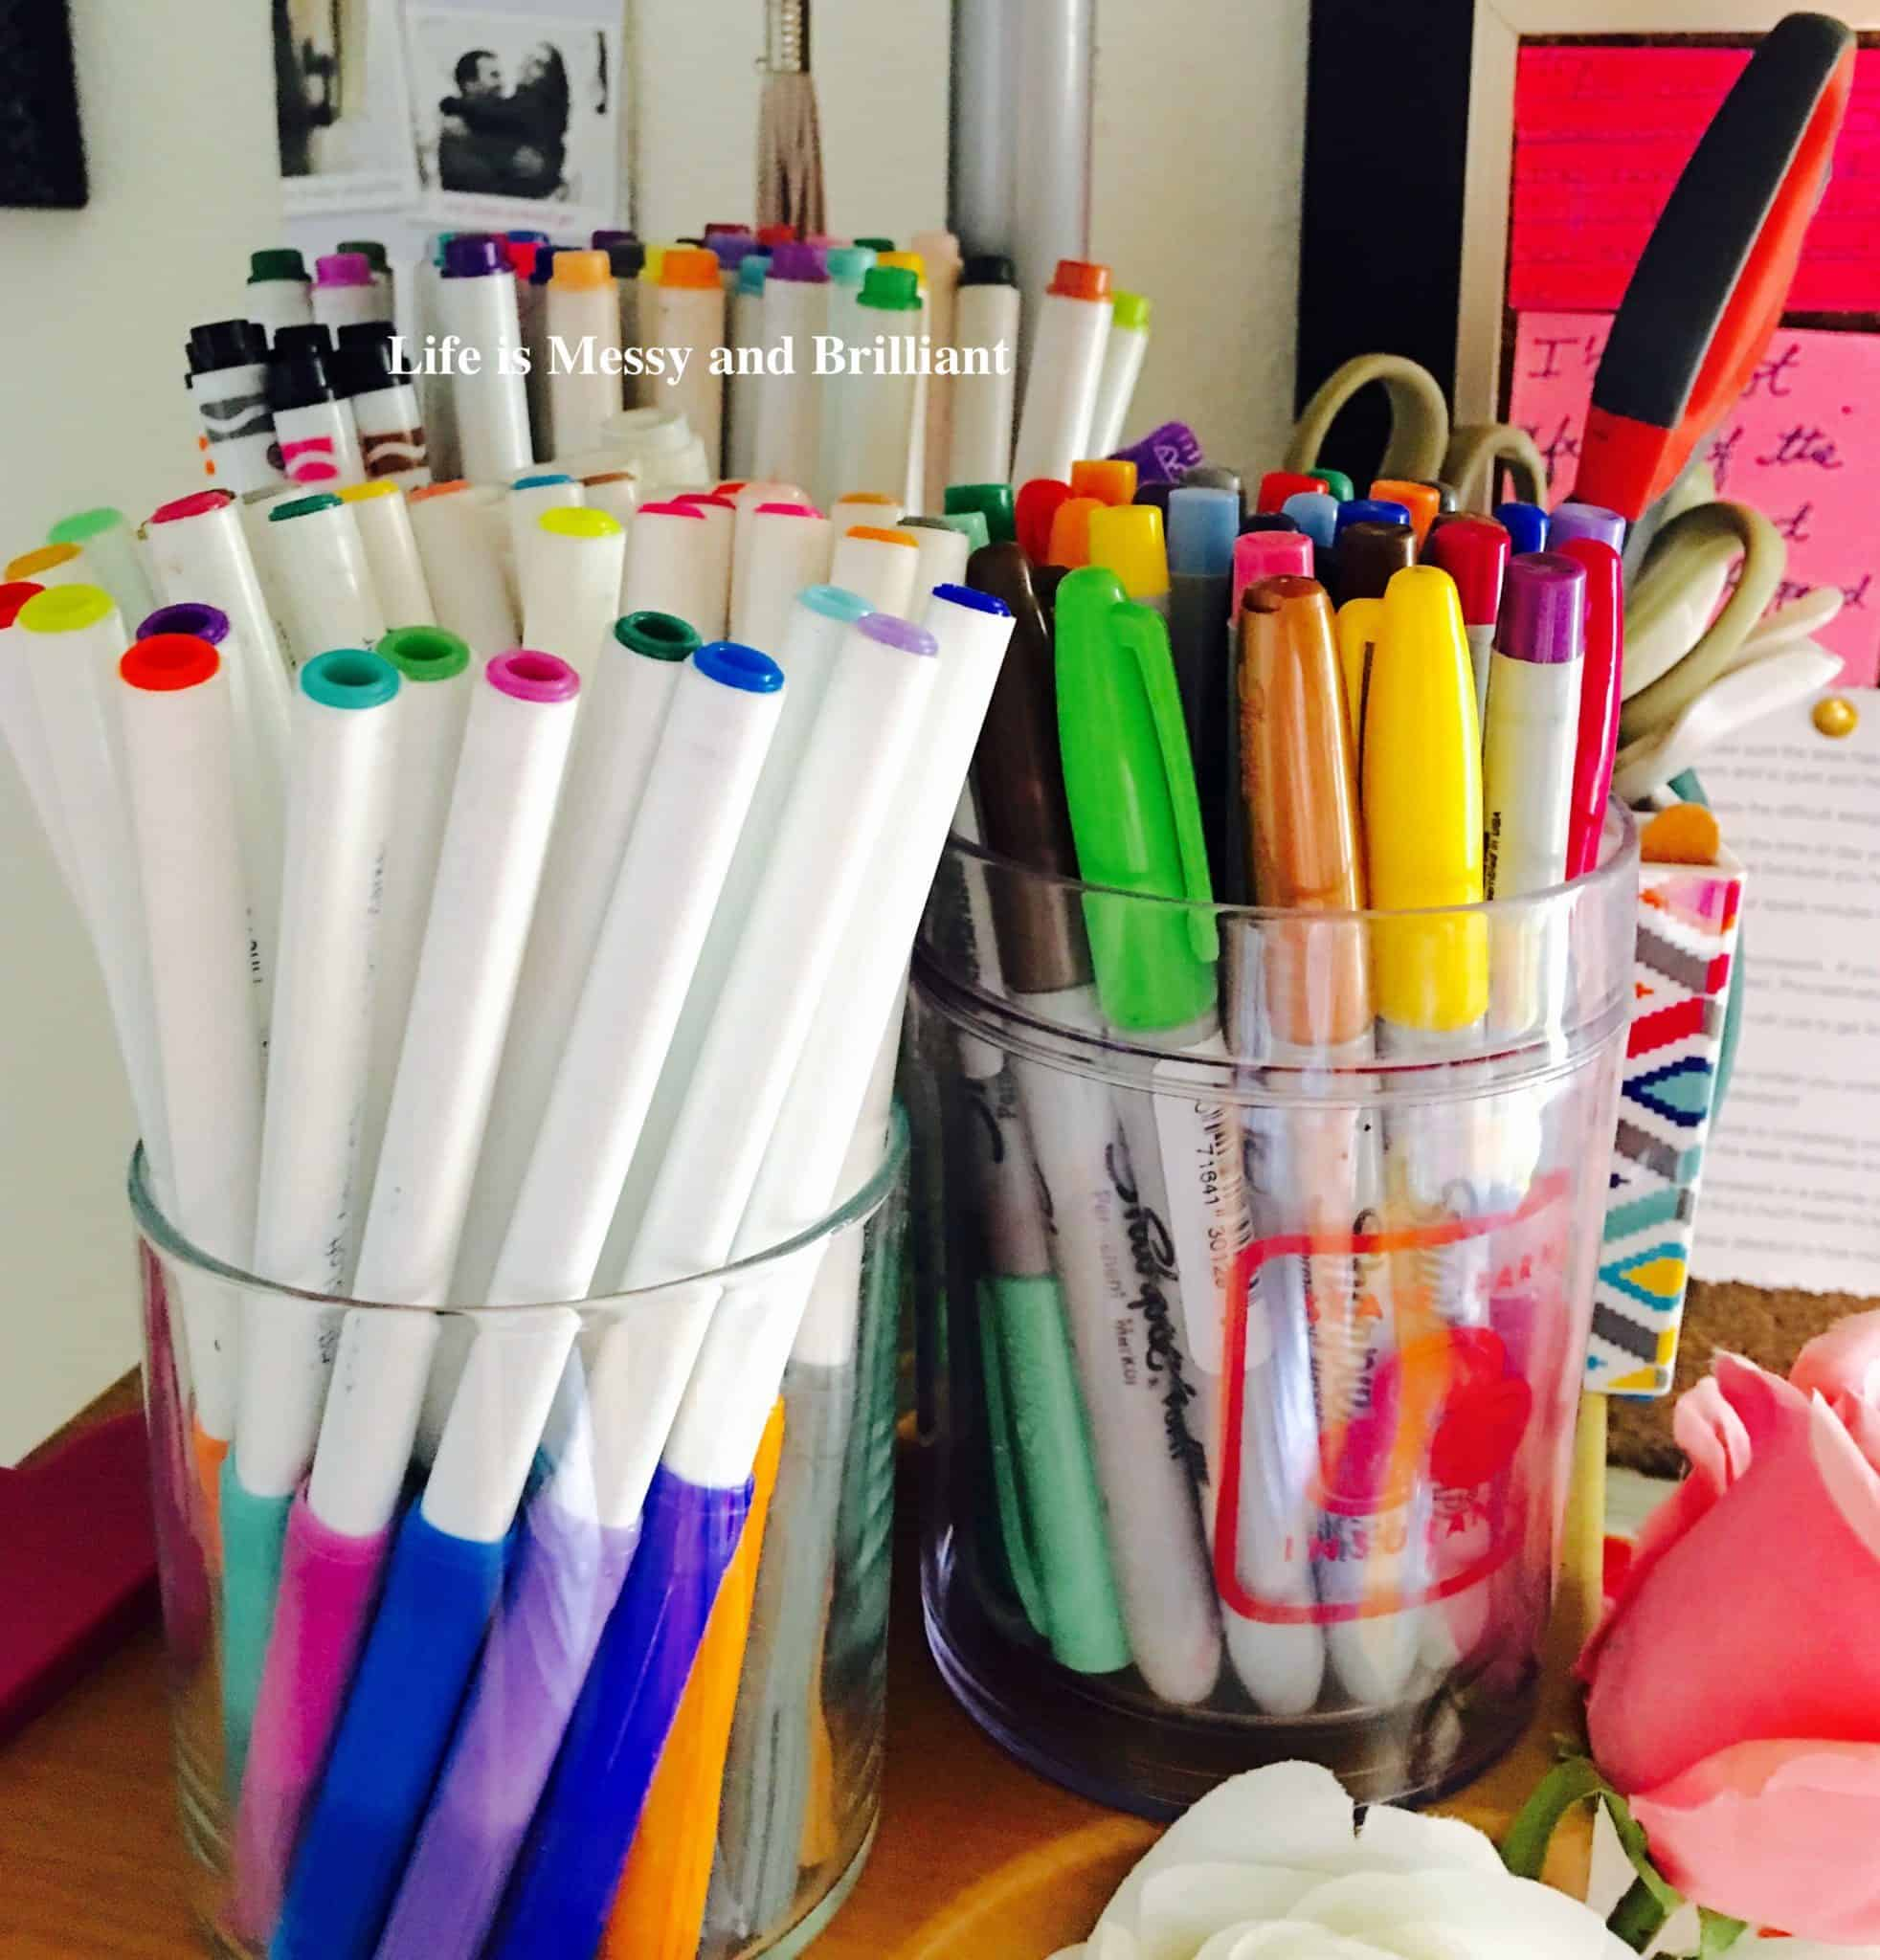 Brilliant Office Organization Ideas: How To Keep An Office Organized + Free Office Organization